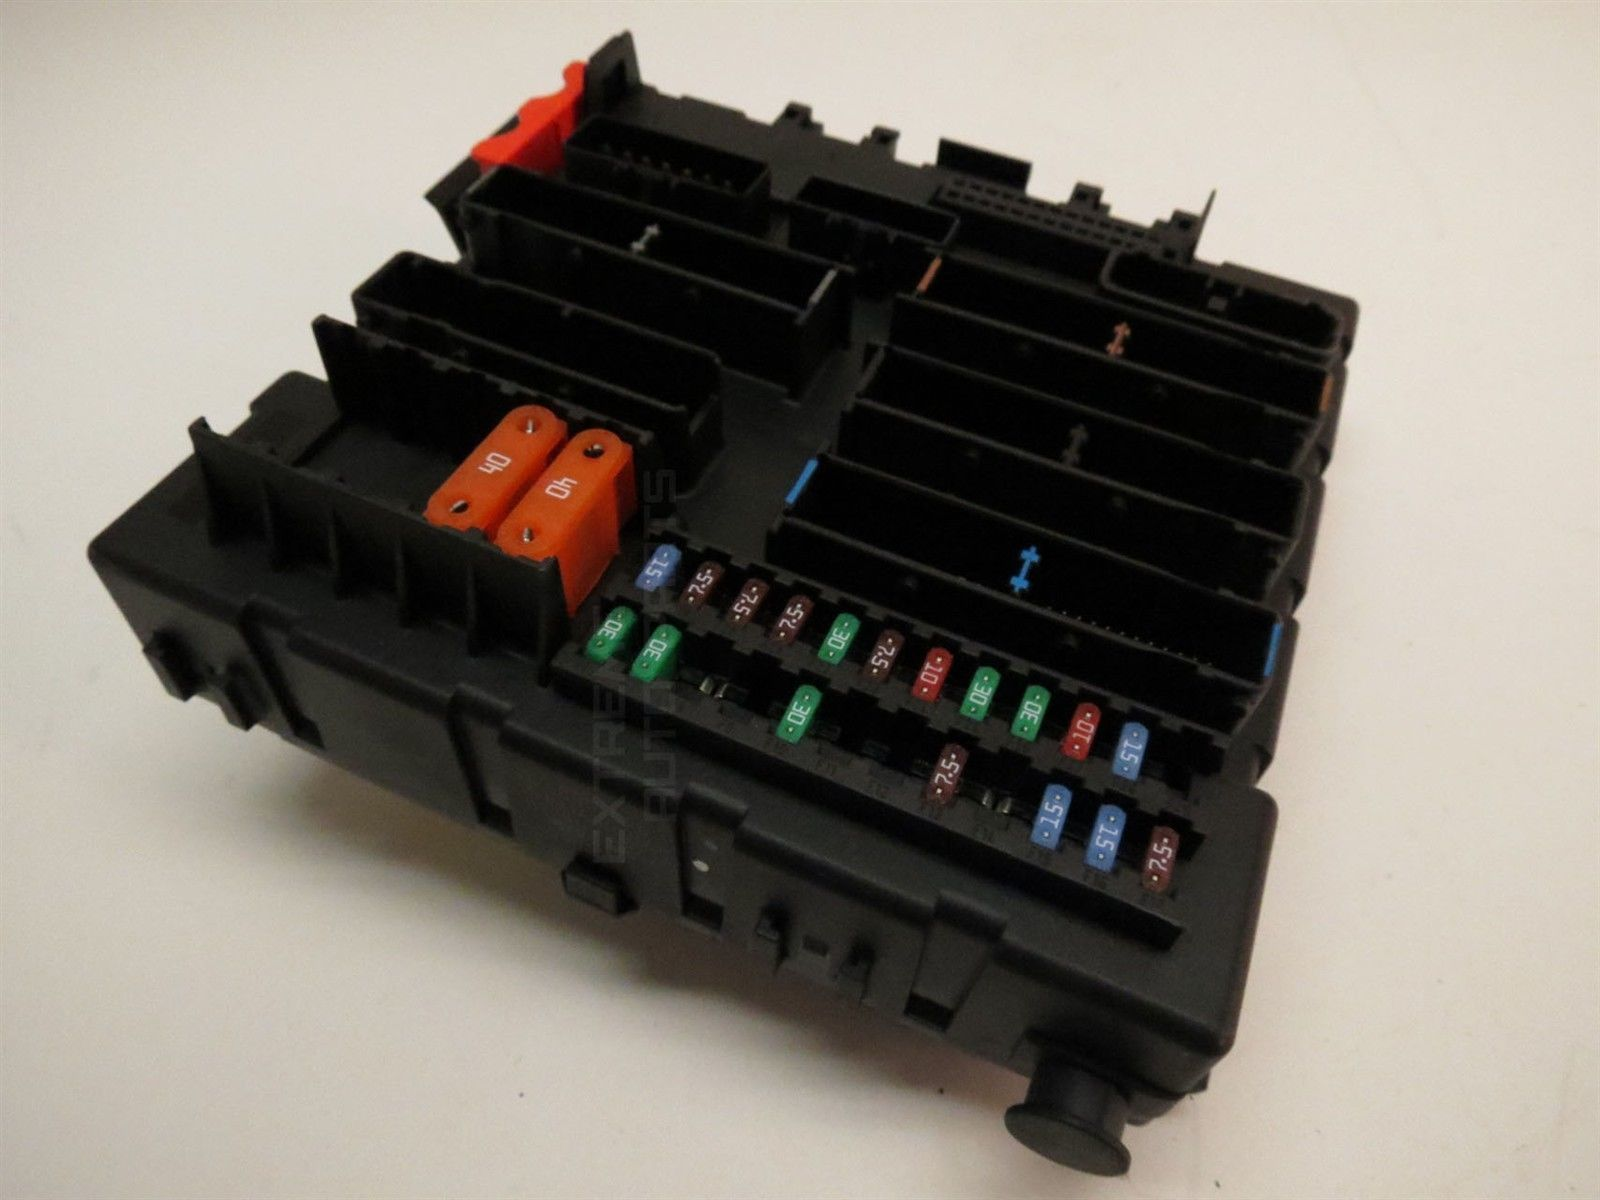 ... Saab 9-3 03-06 Rear Interior Fuse Box, In Trunk 12804330